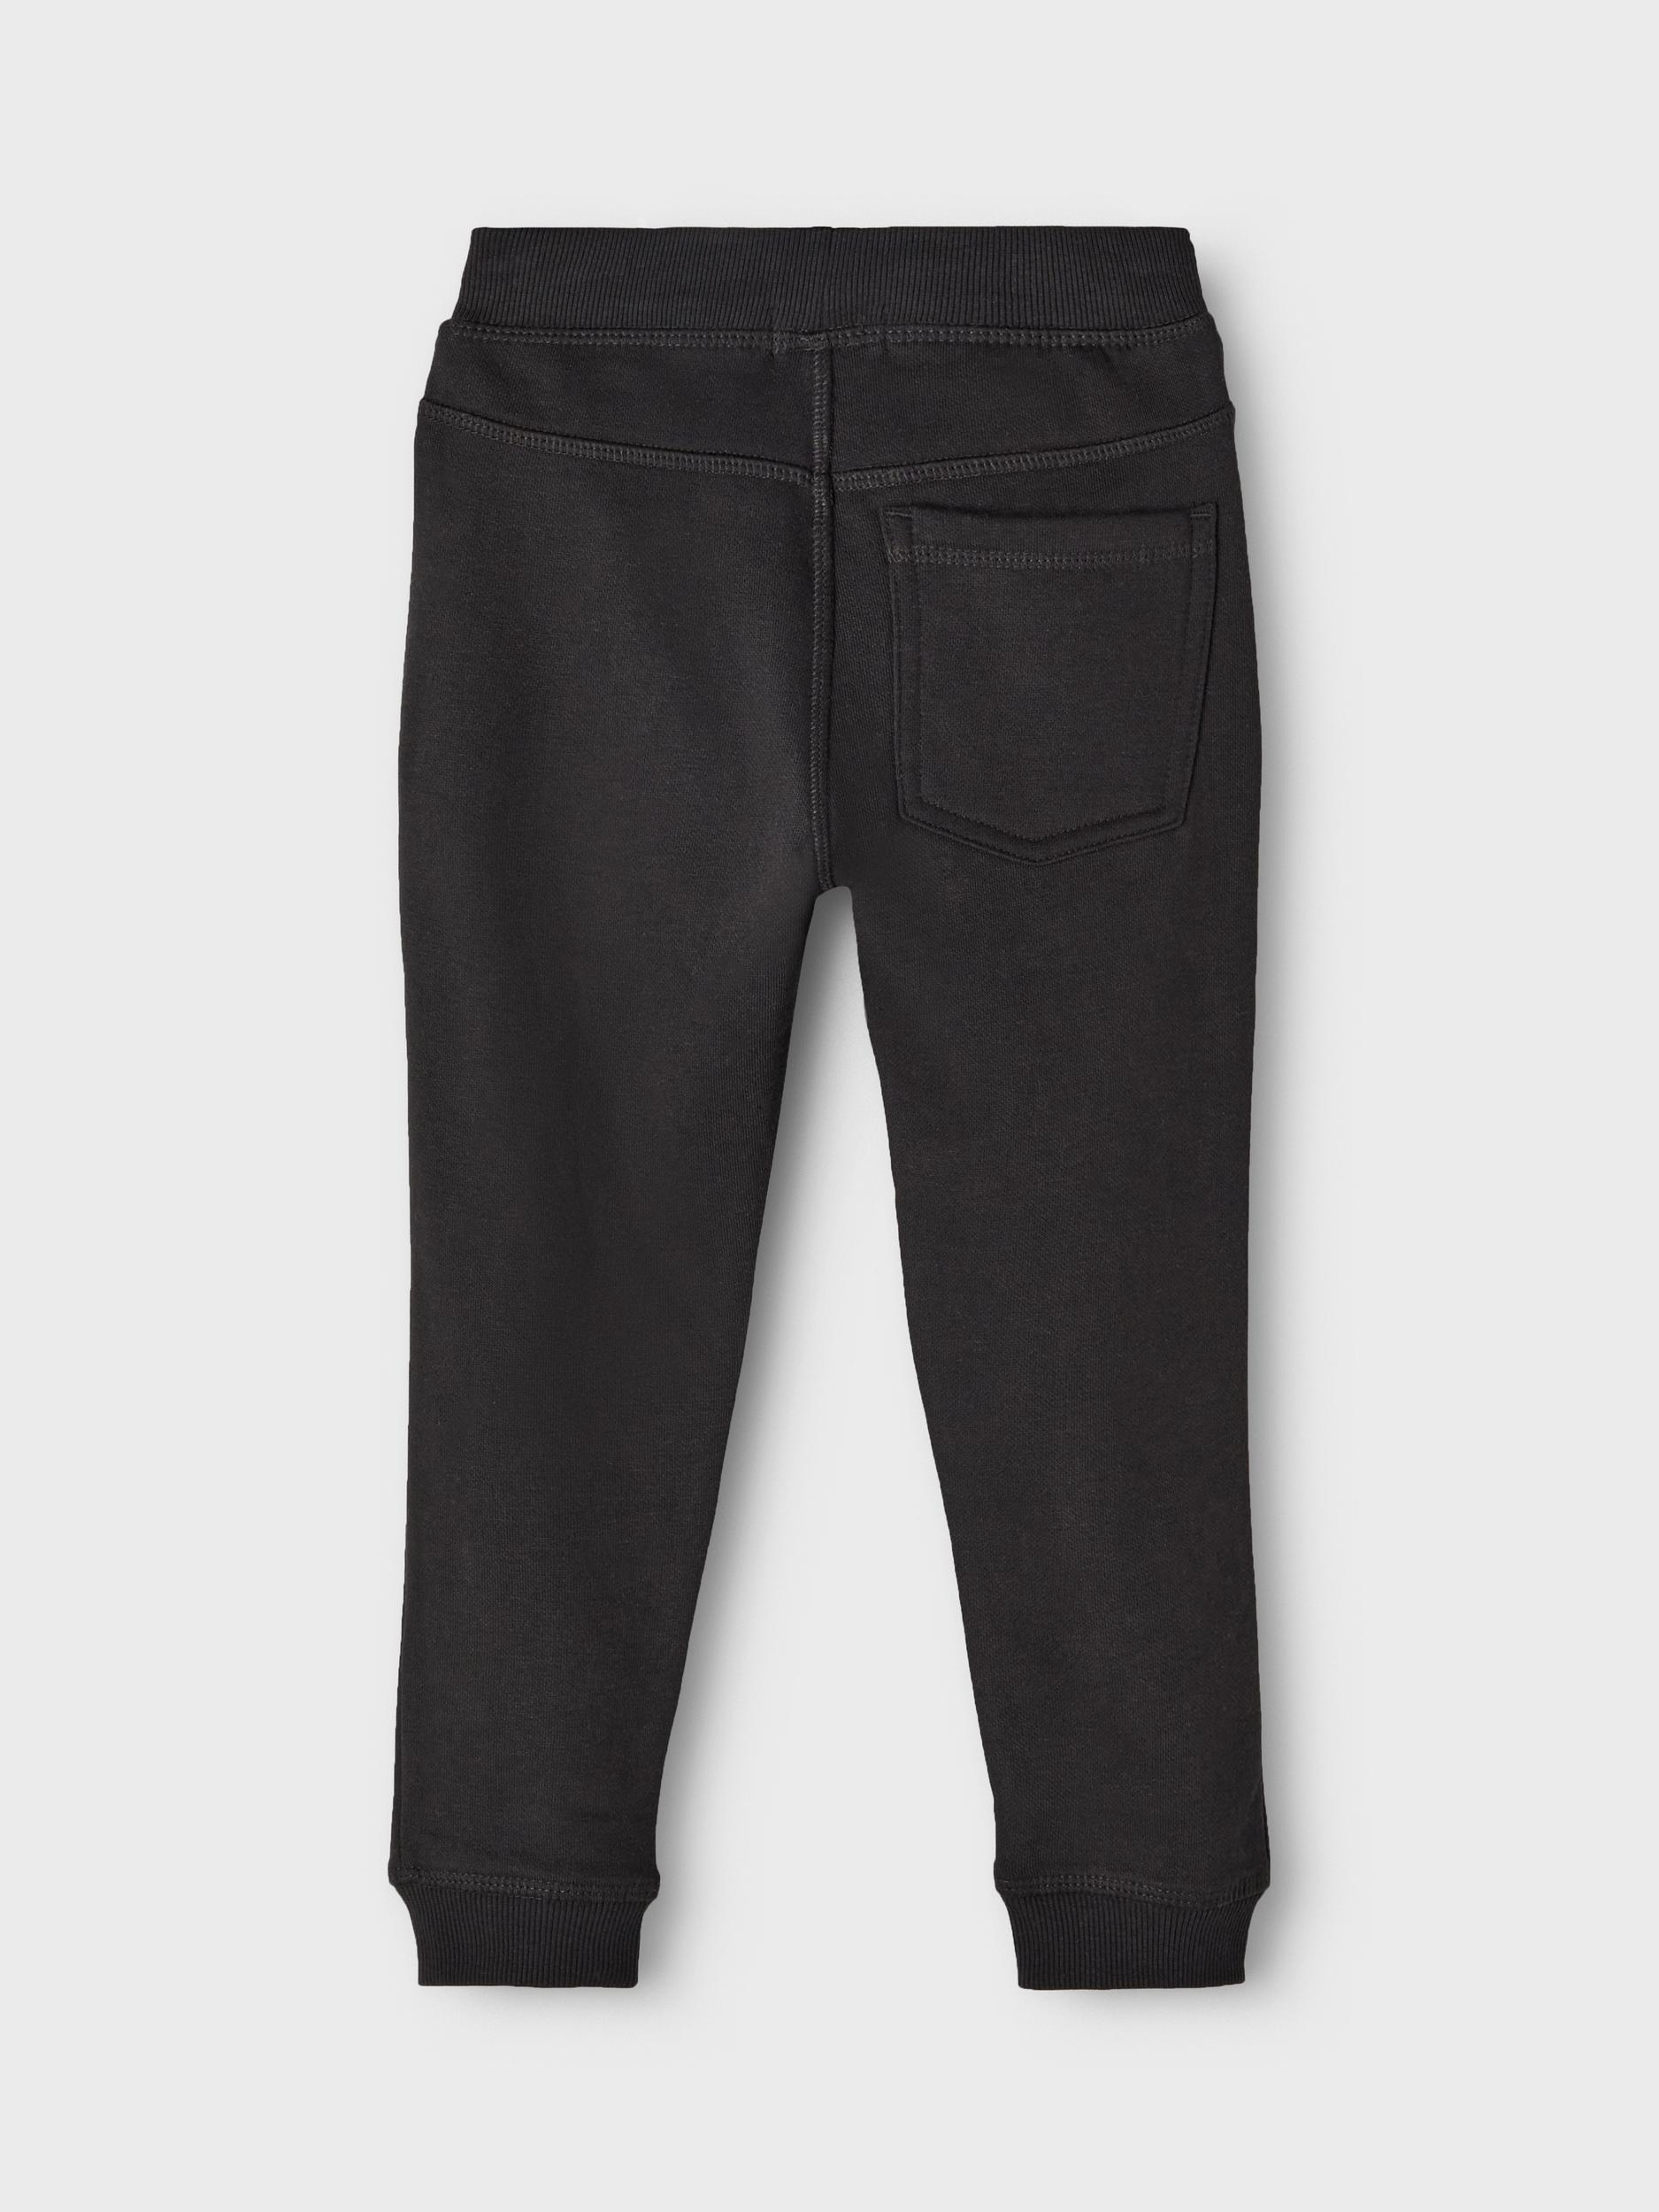 Name It Vimo sweatpants, sort, 92 cm